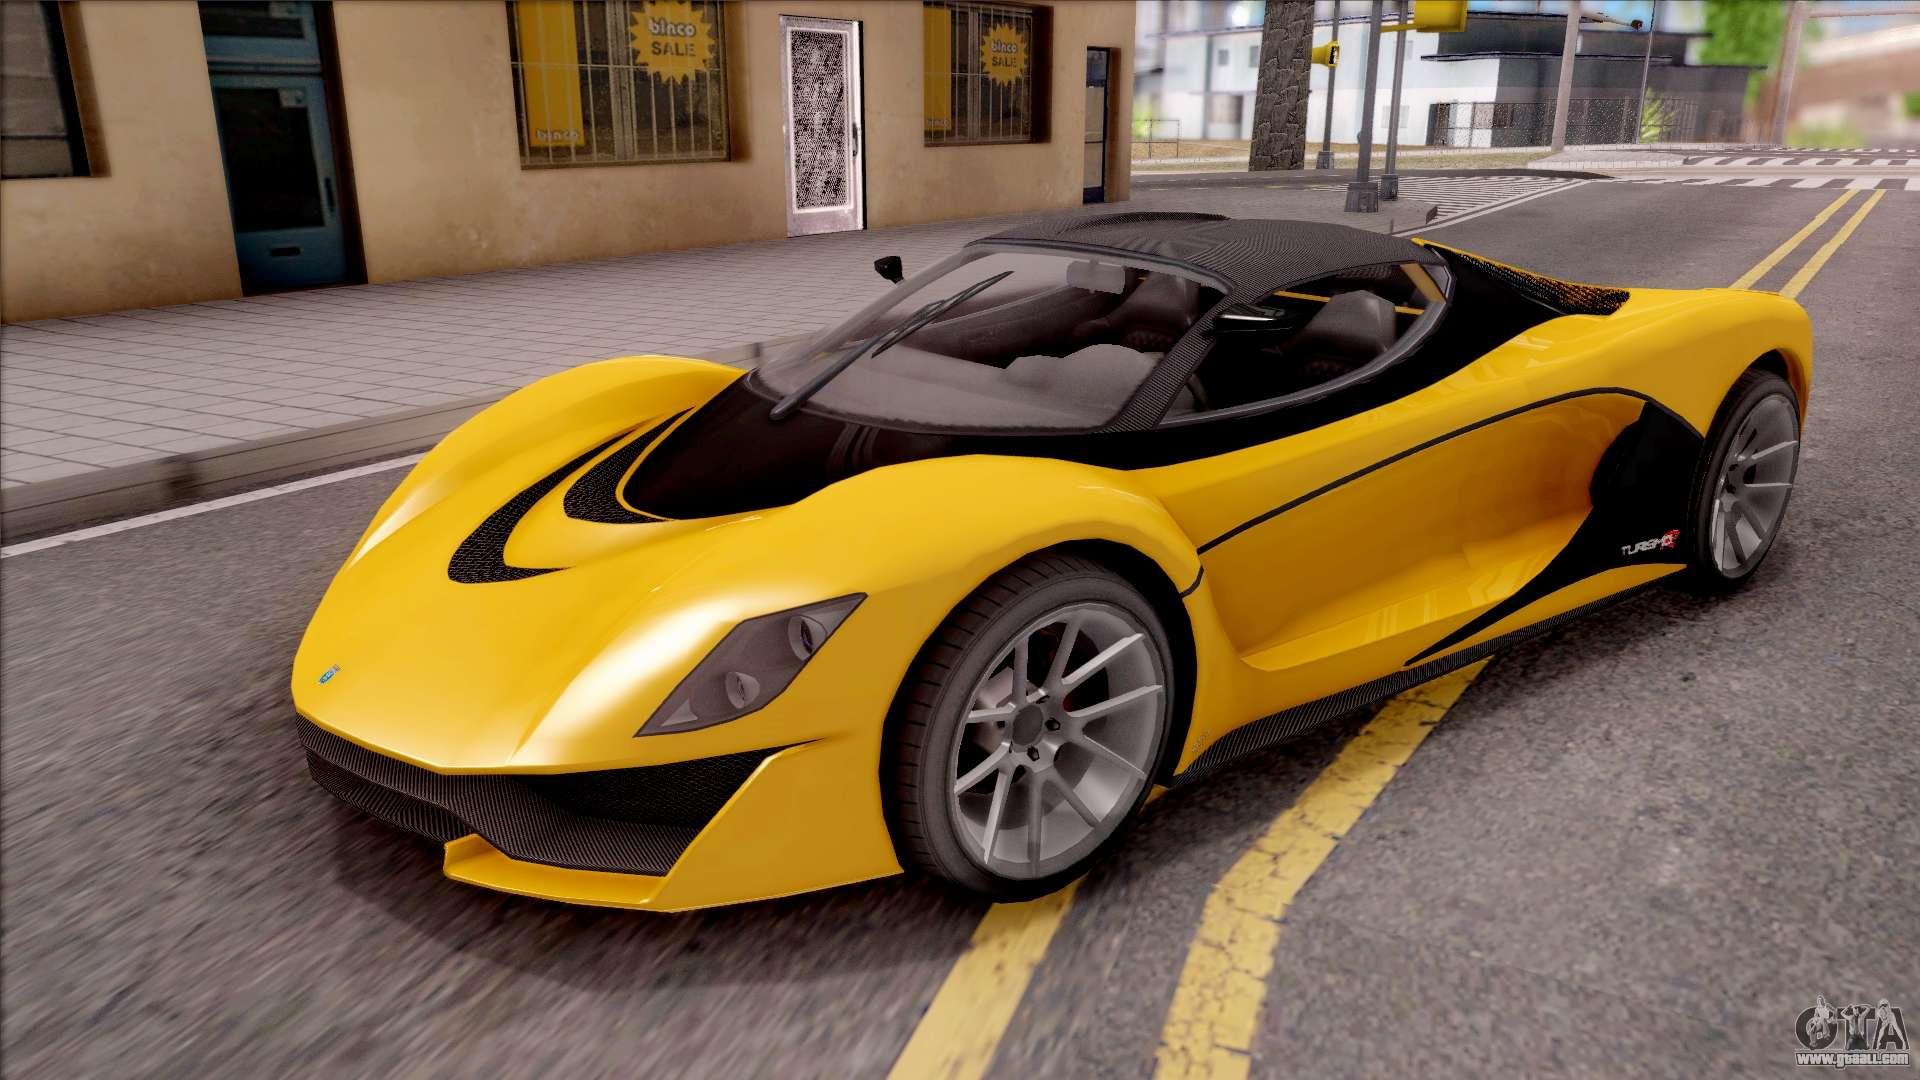 Turismo Car: Grotti Turismo R From GTA V For GTA San Andreas